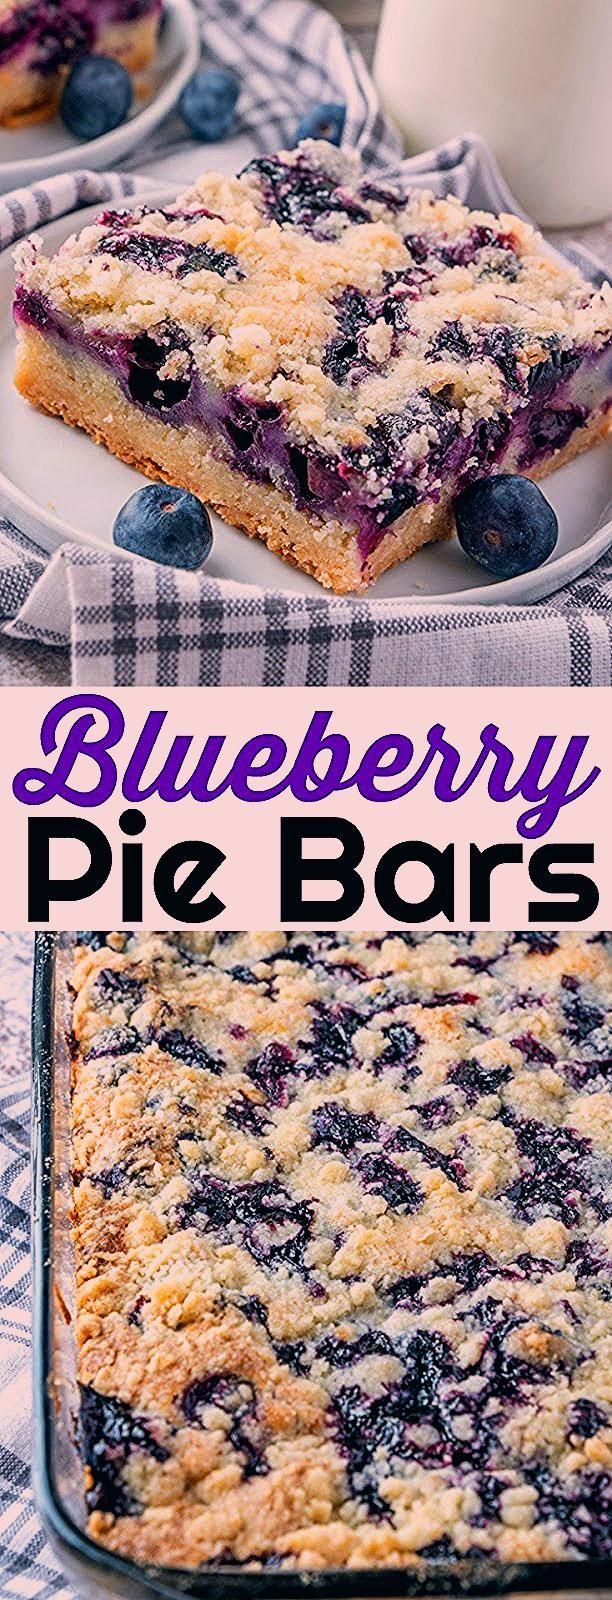 Photo of Delicious Blueberry Pie Bars Recipe